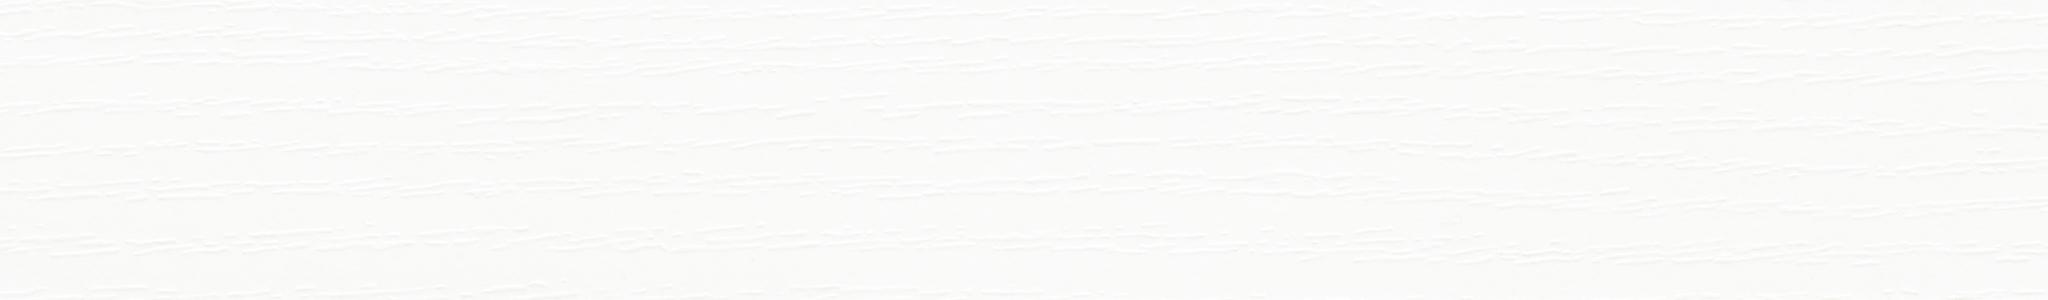 HU 30113 Melamin Kante Weiß Pore